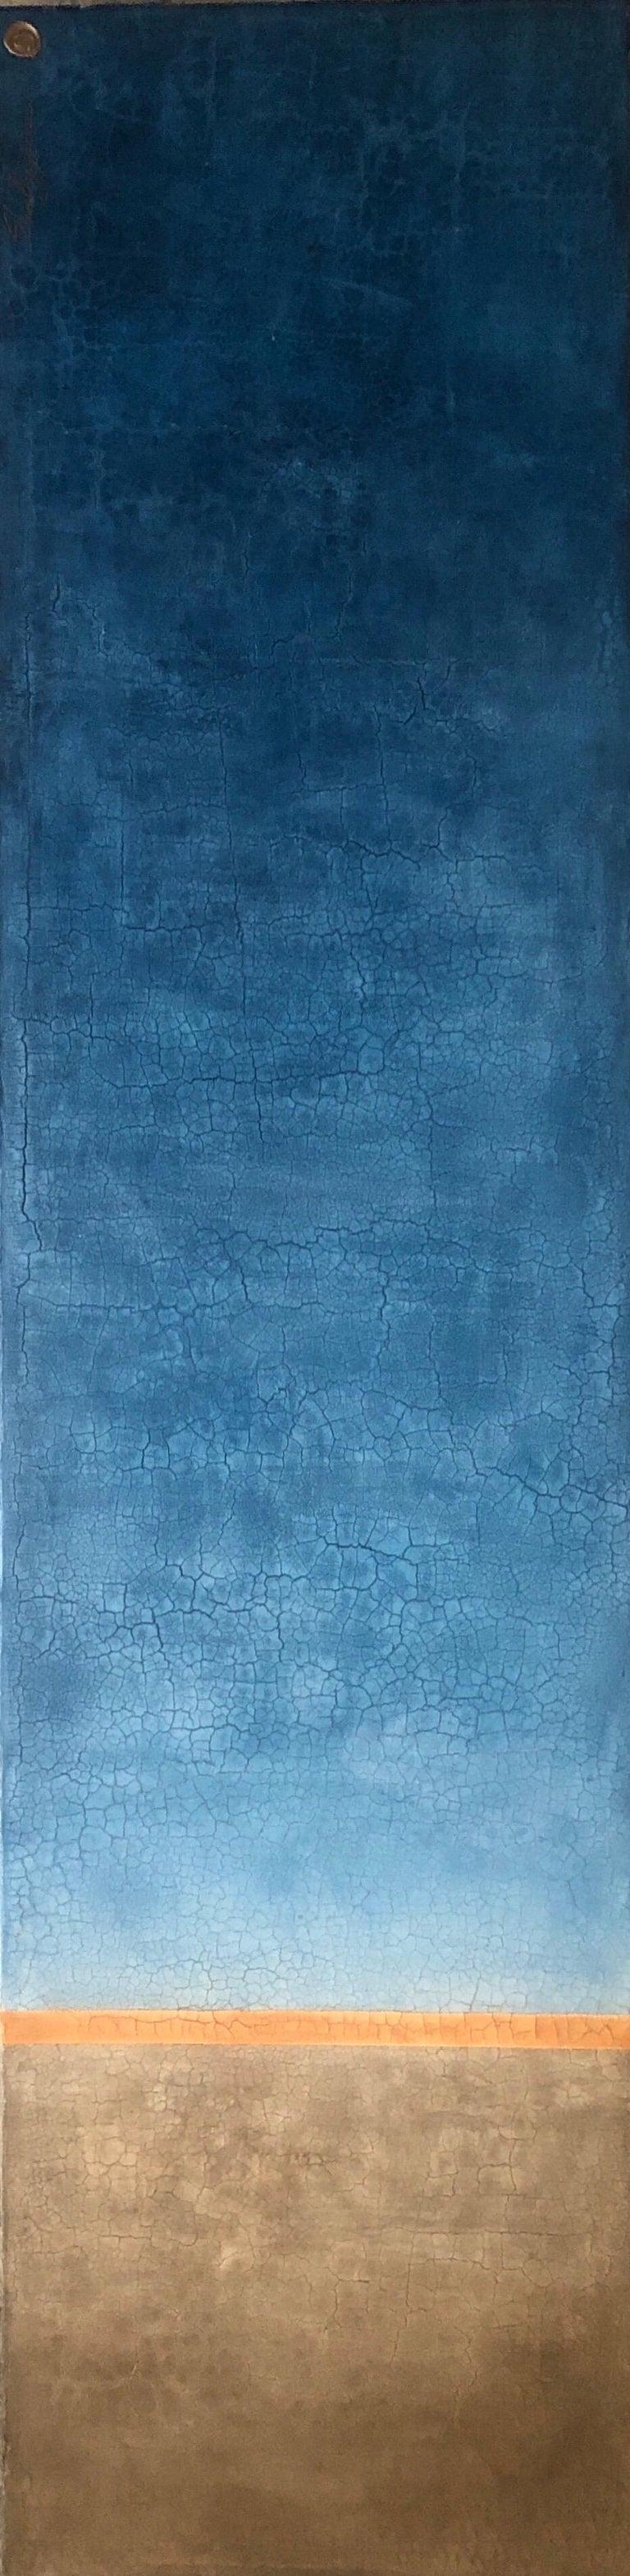 "Svetlana Shalygina Abstract Painting - Blue Orange Raw Amber Hues Minimalist Contemporary Mixed Media Painting 72""x18"""